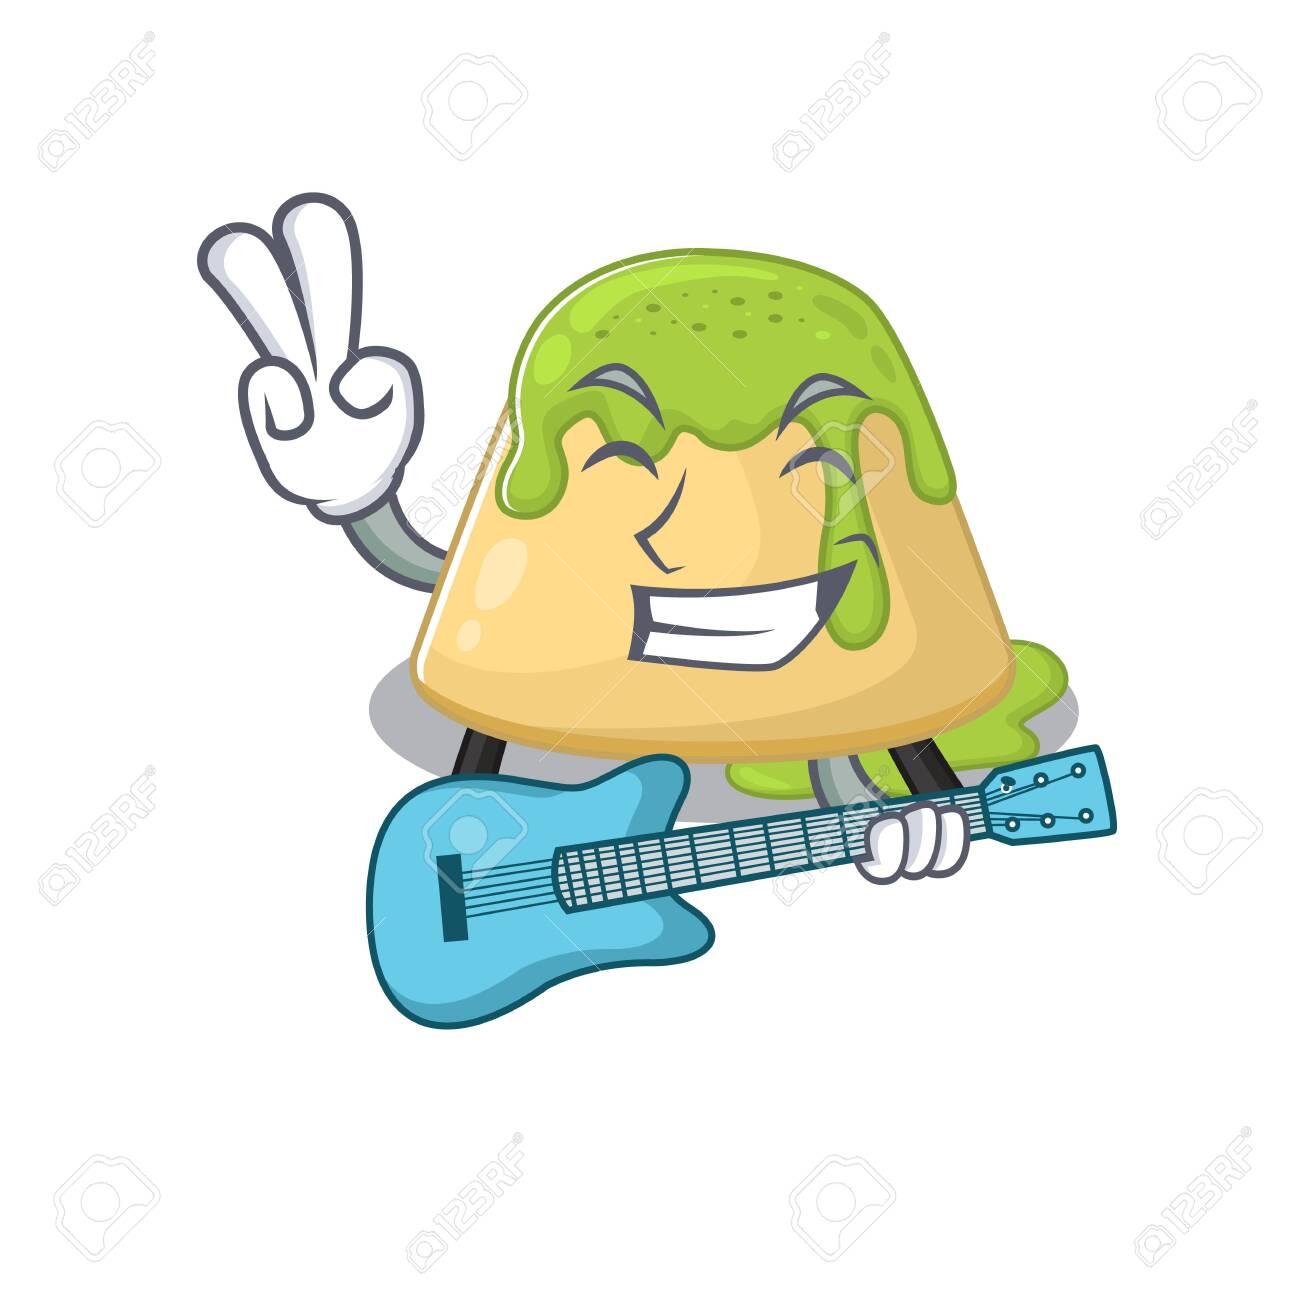 Supper cool pudding green tea cartoon playing a guitar. Vector illustration - 142055298